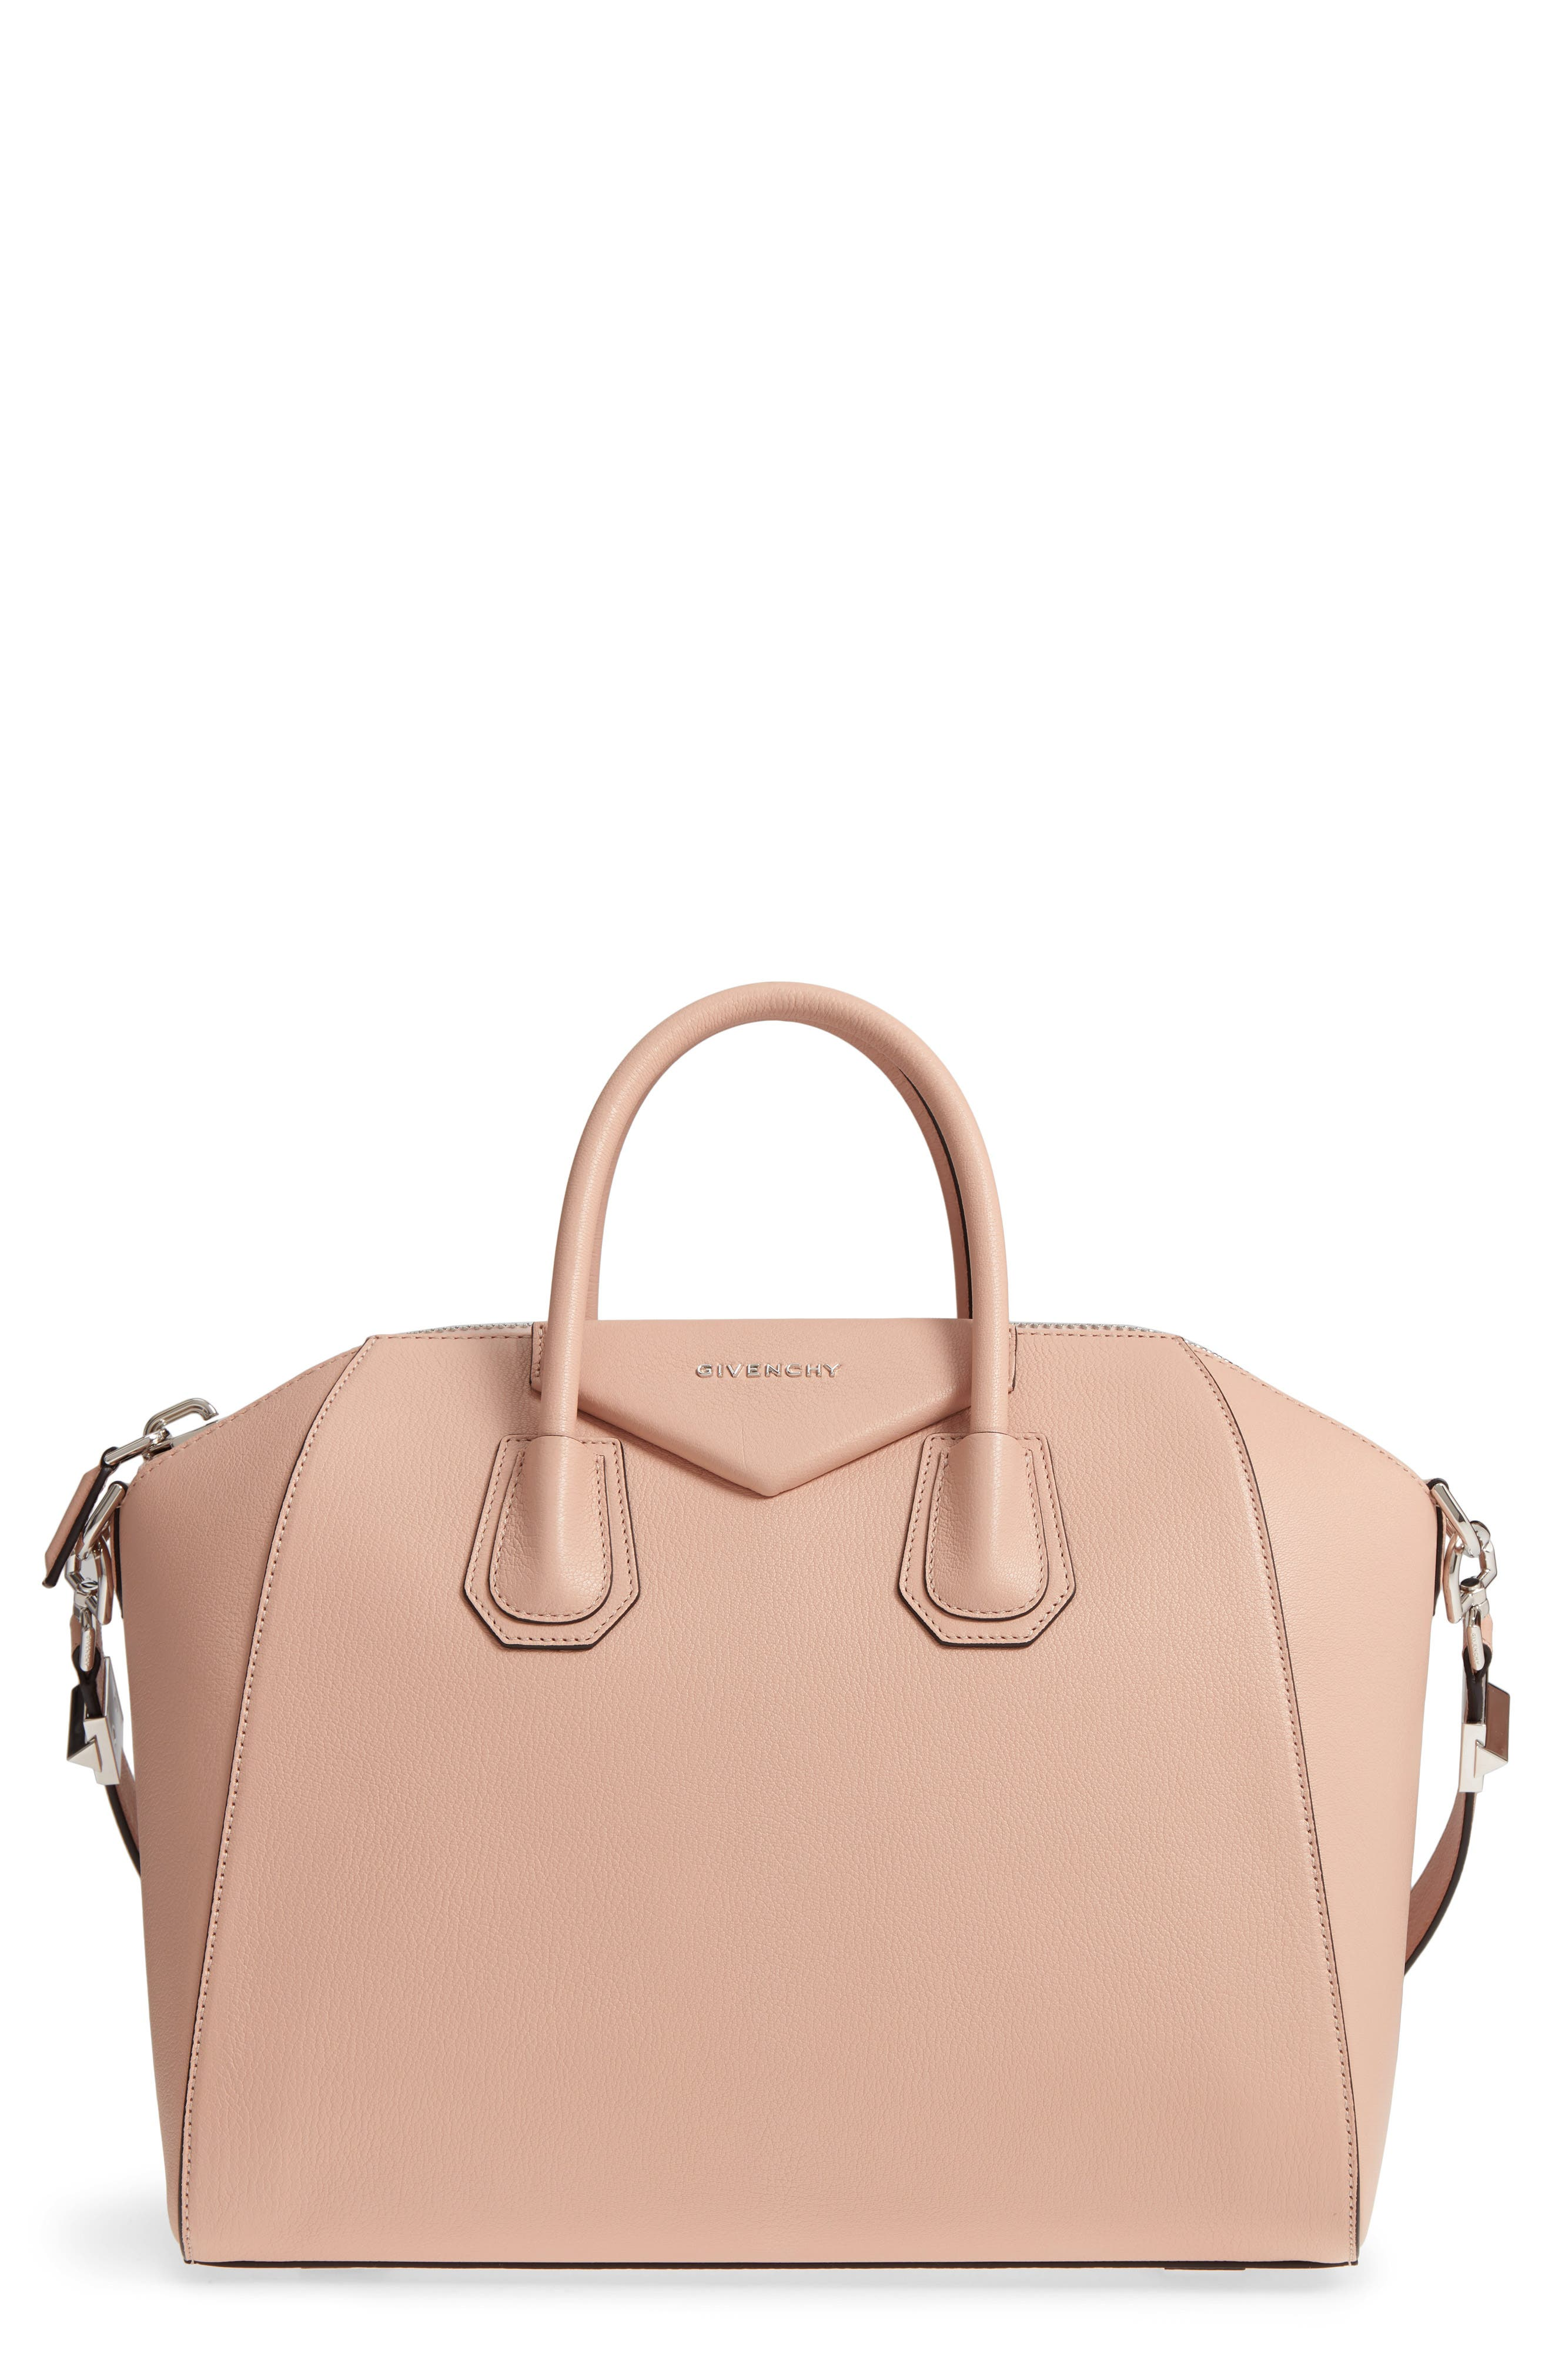 Main Image - Givenchy 'Medium Antigona' Sugar Leather Satchel